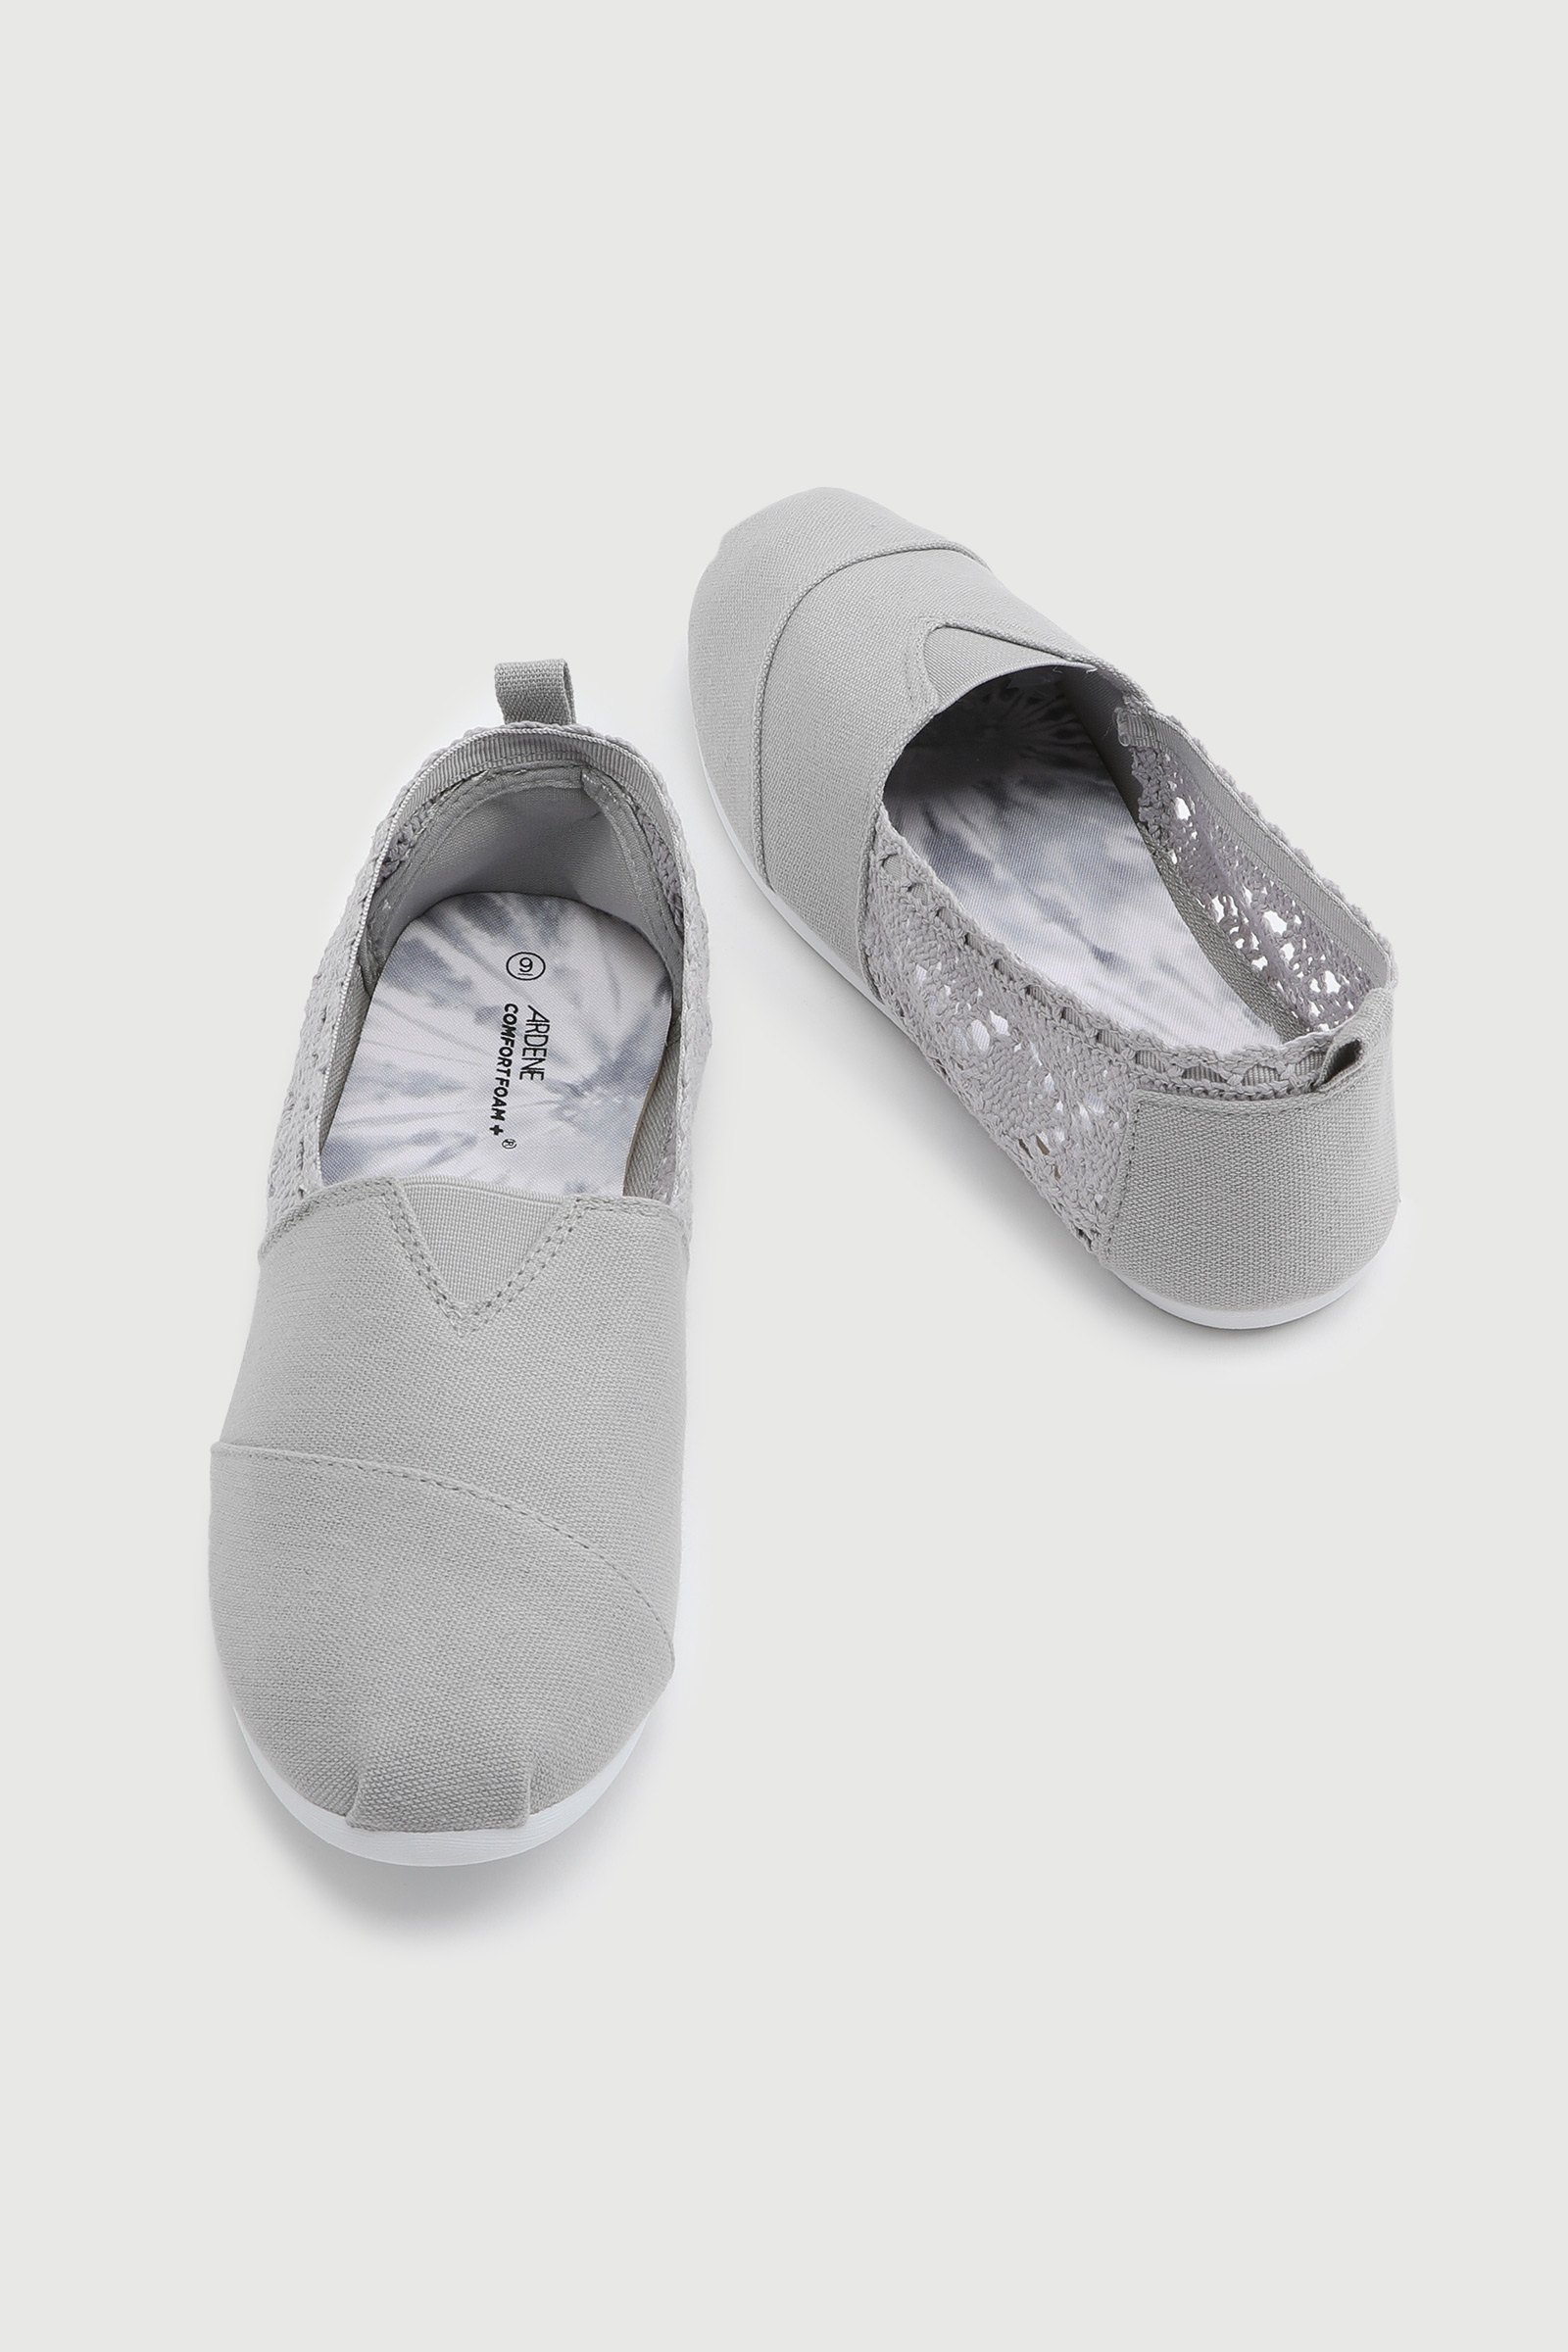 Crocheted Slip-On Sneakers